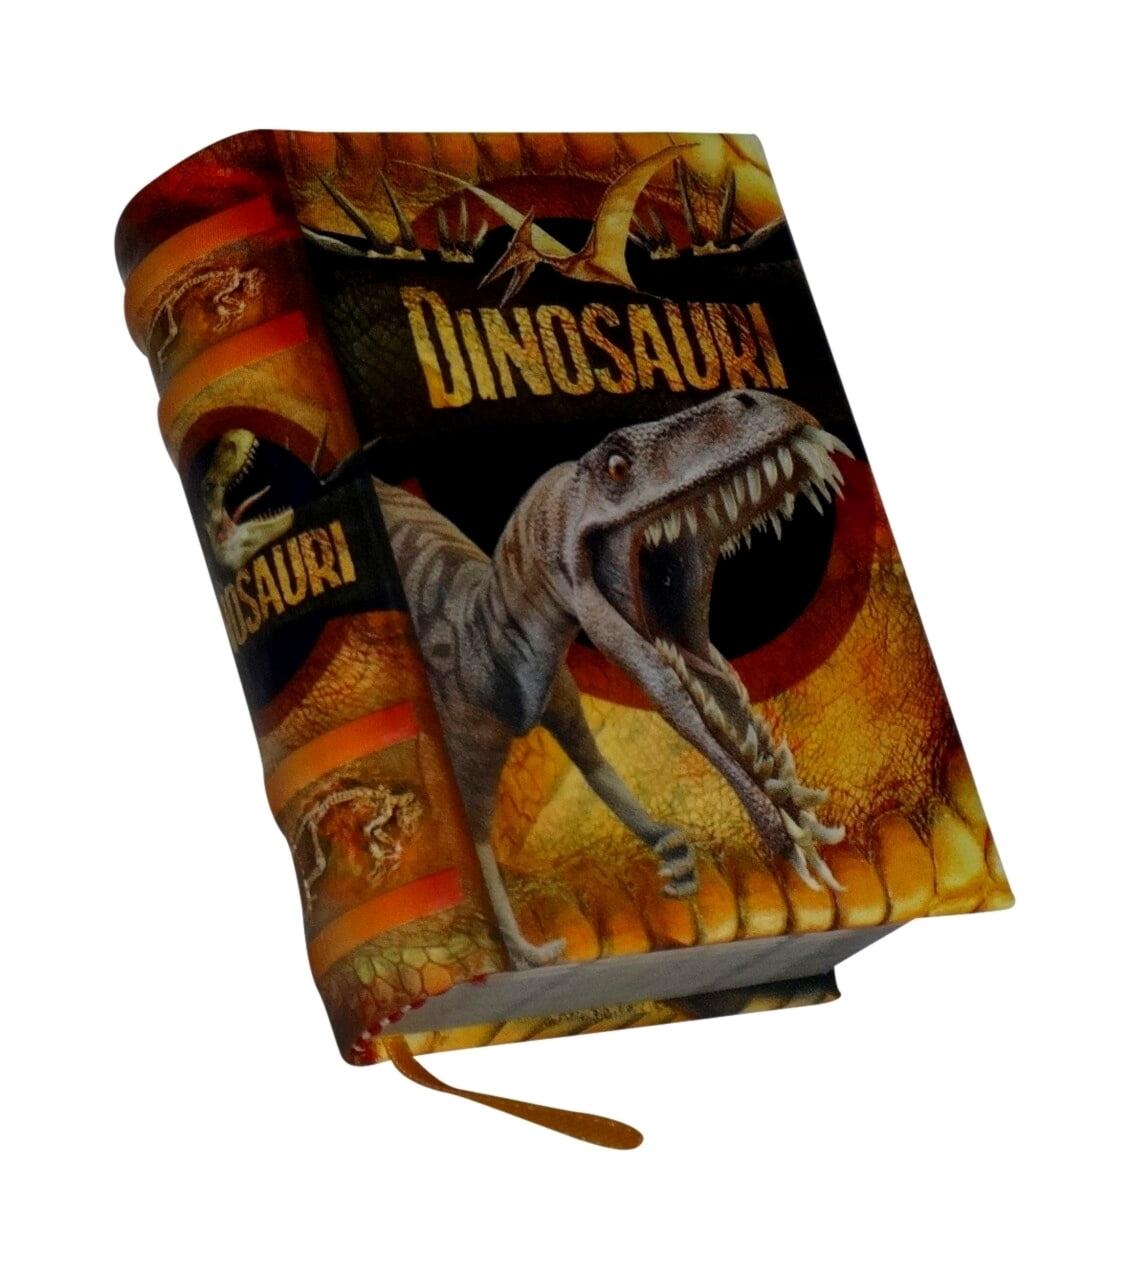 Dinosauri-miniature-book-libro